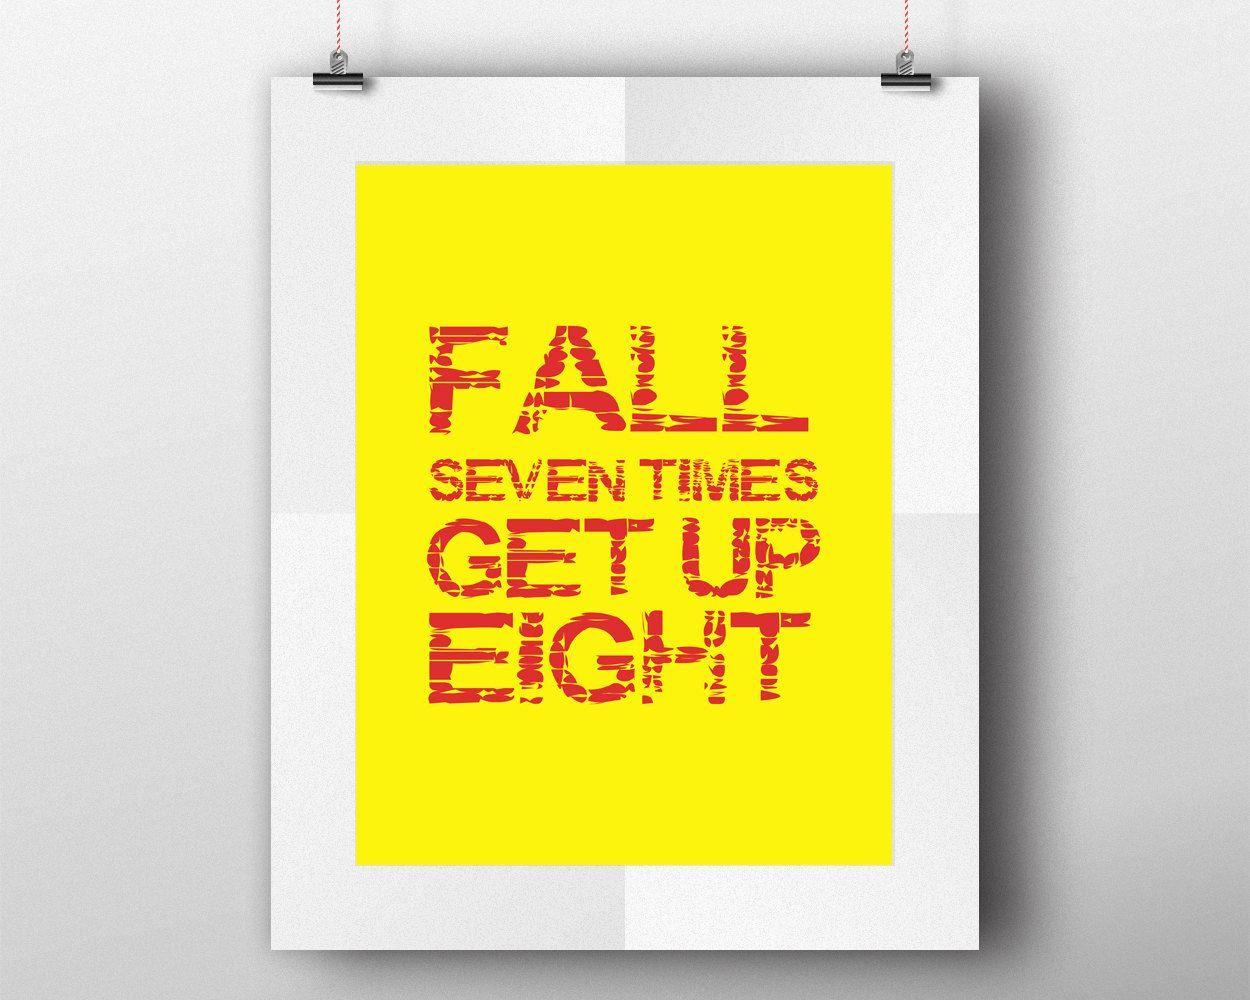 Wall art motivation digital print motivation poster art motivation